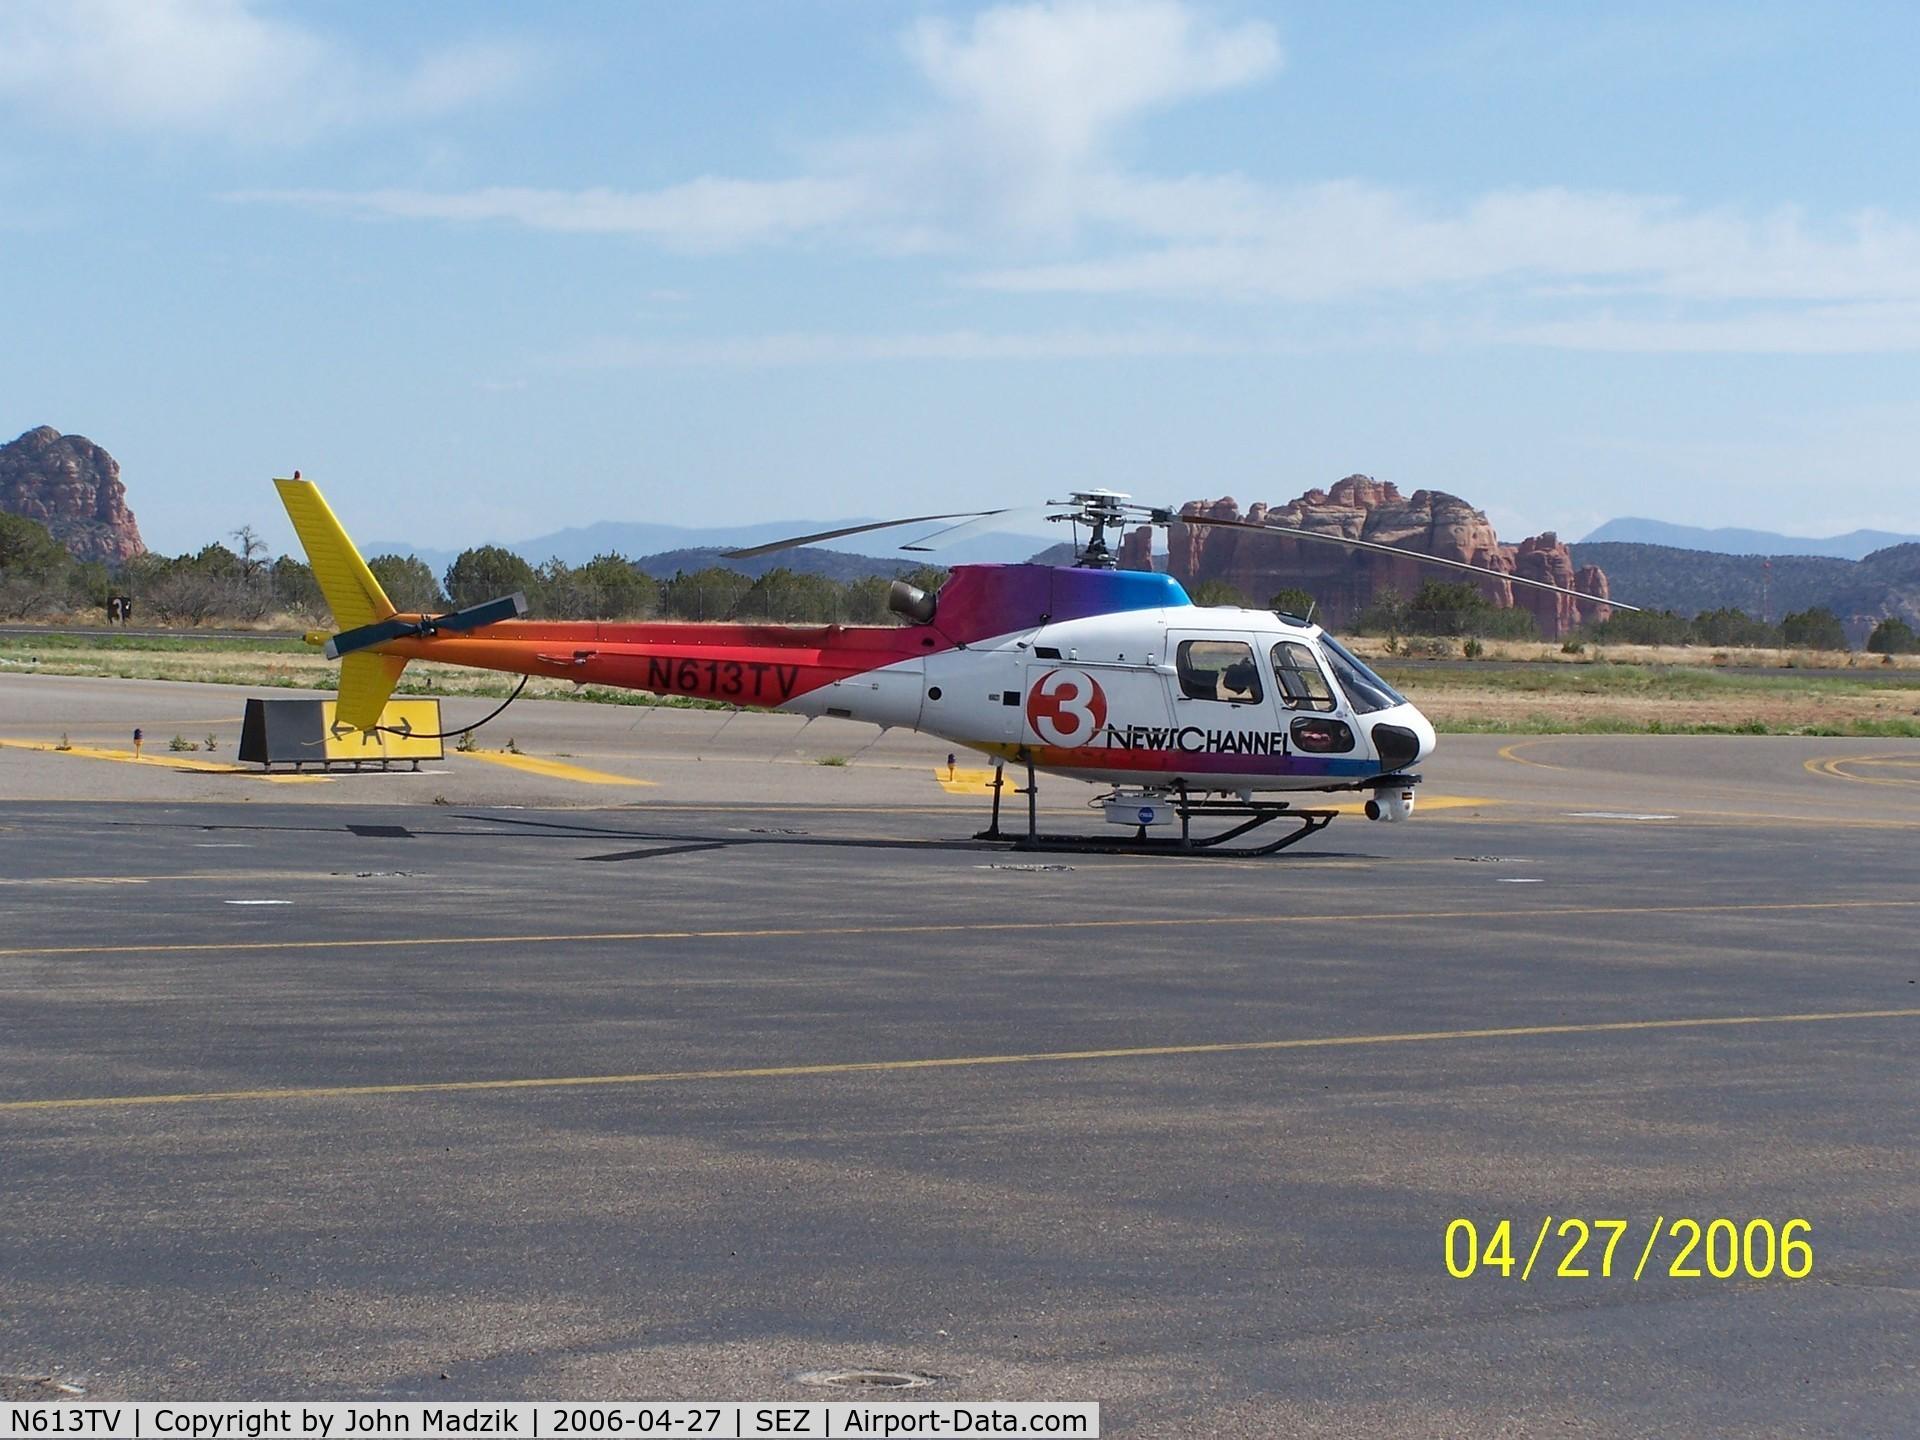 N613TV, 2007 Eurocopter AS-350B-2 Ecureuil C/N 4291, Sedona Airport